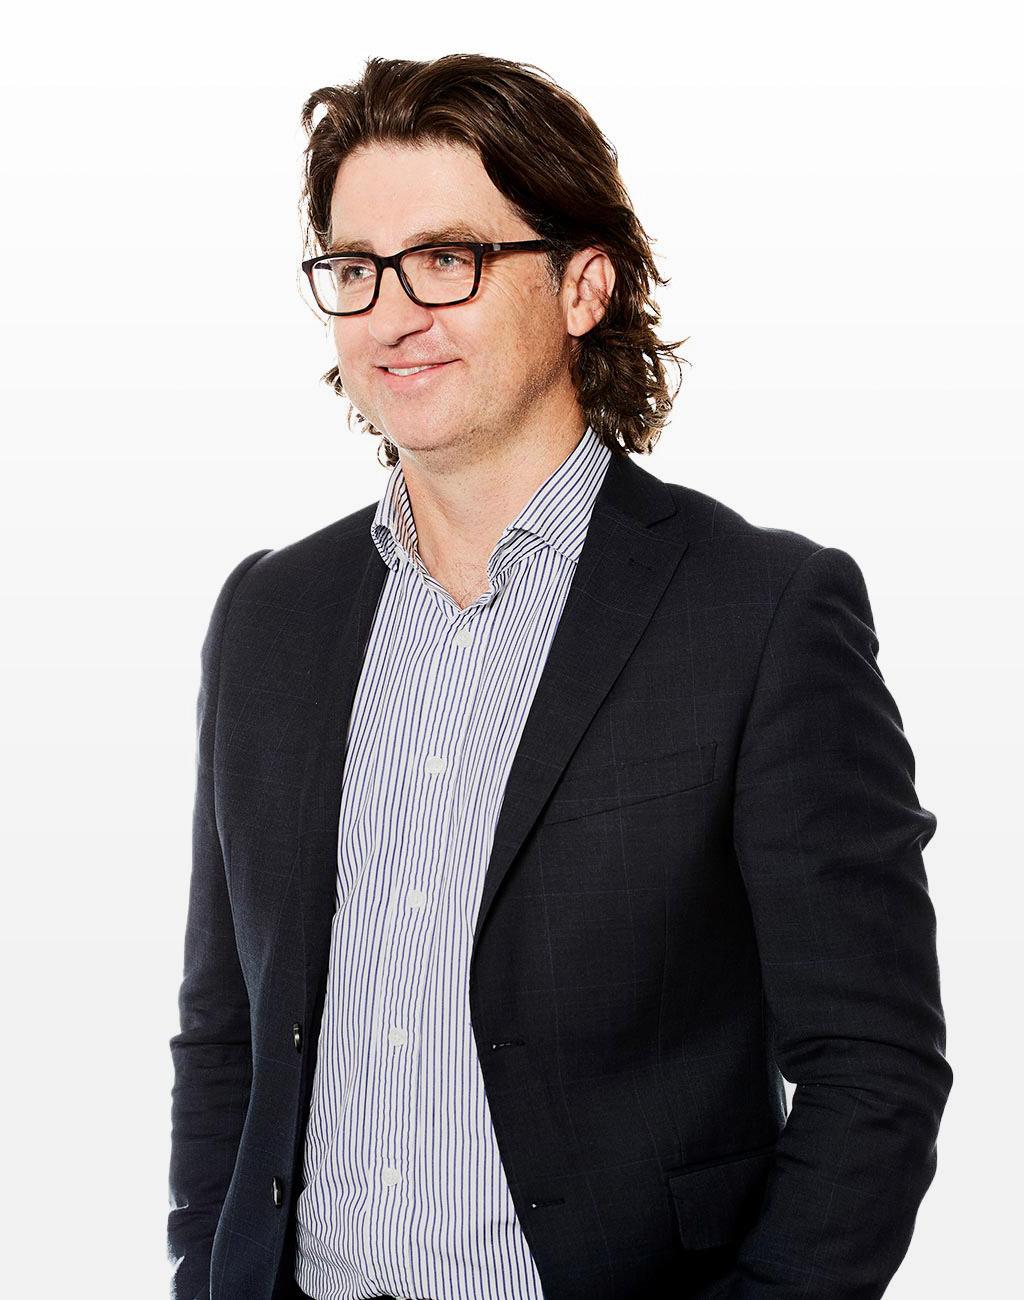 Simon Gregory